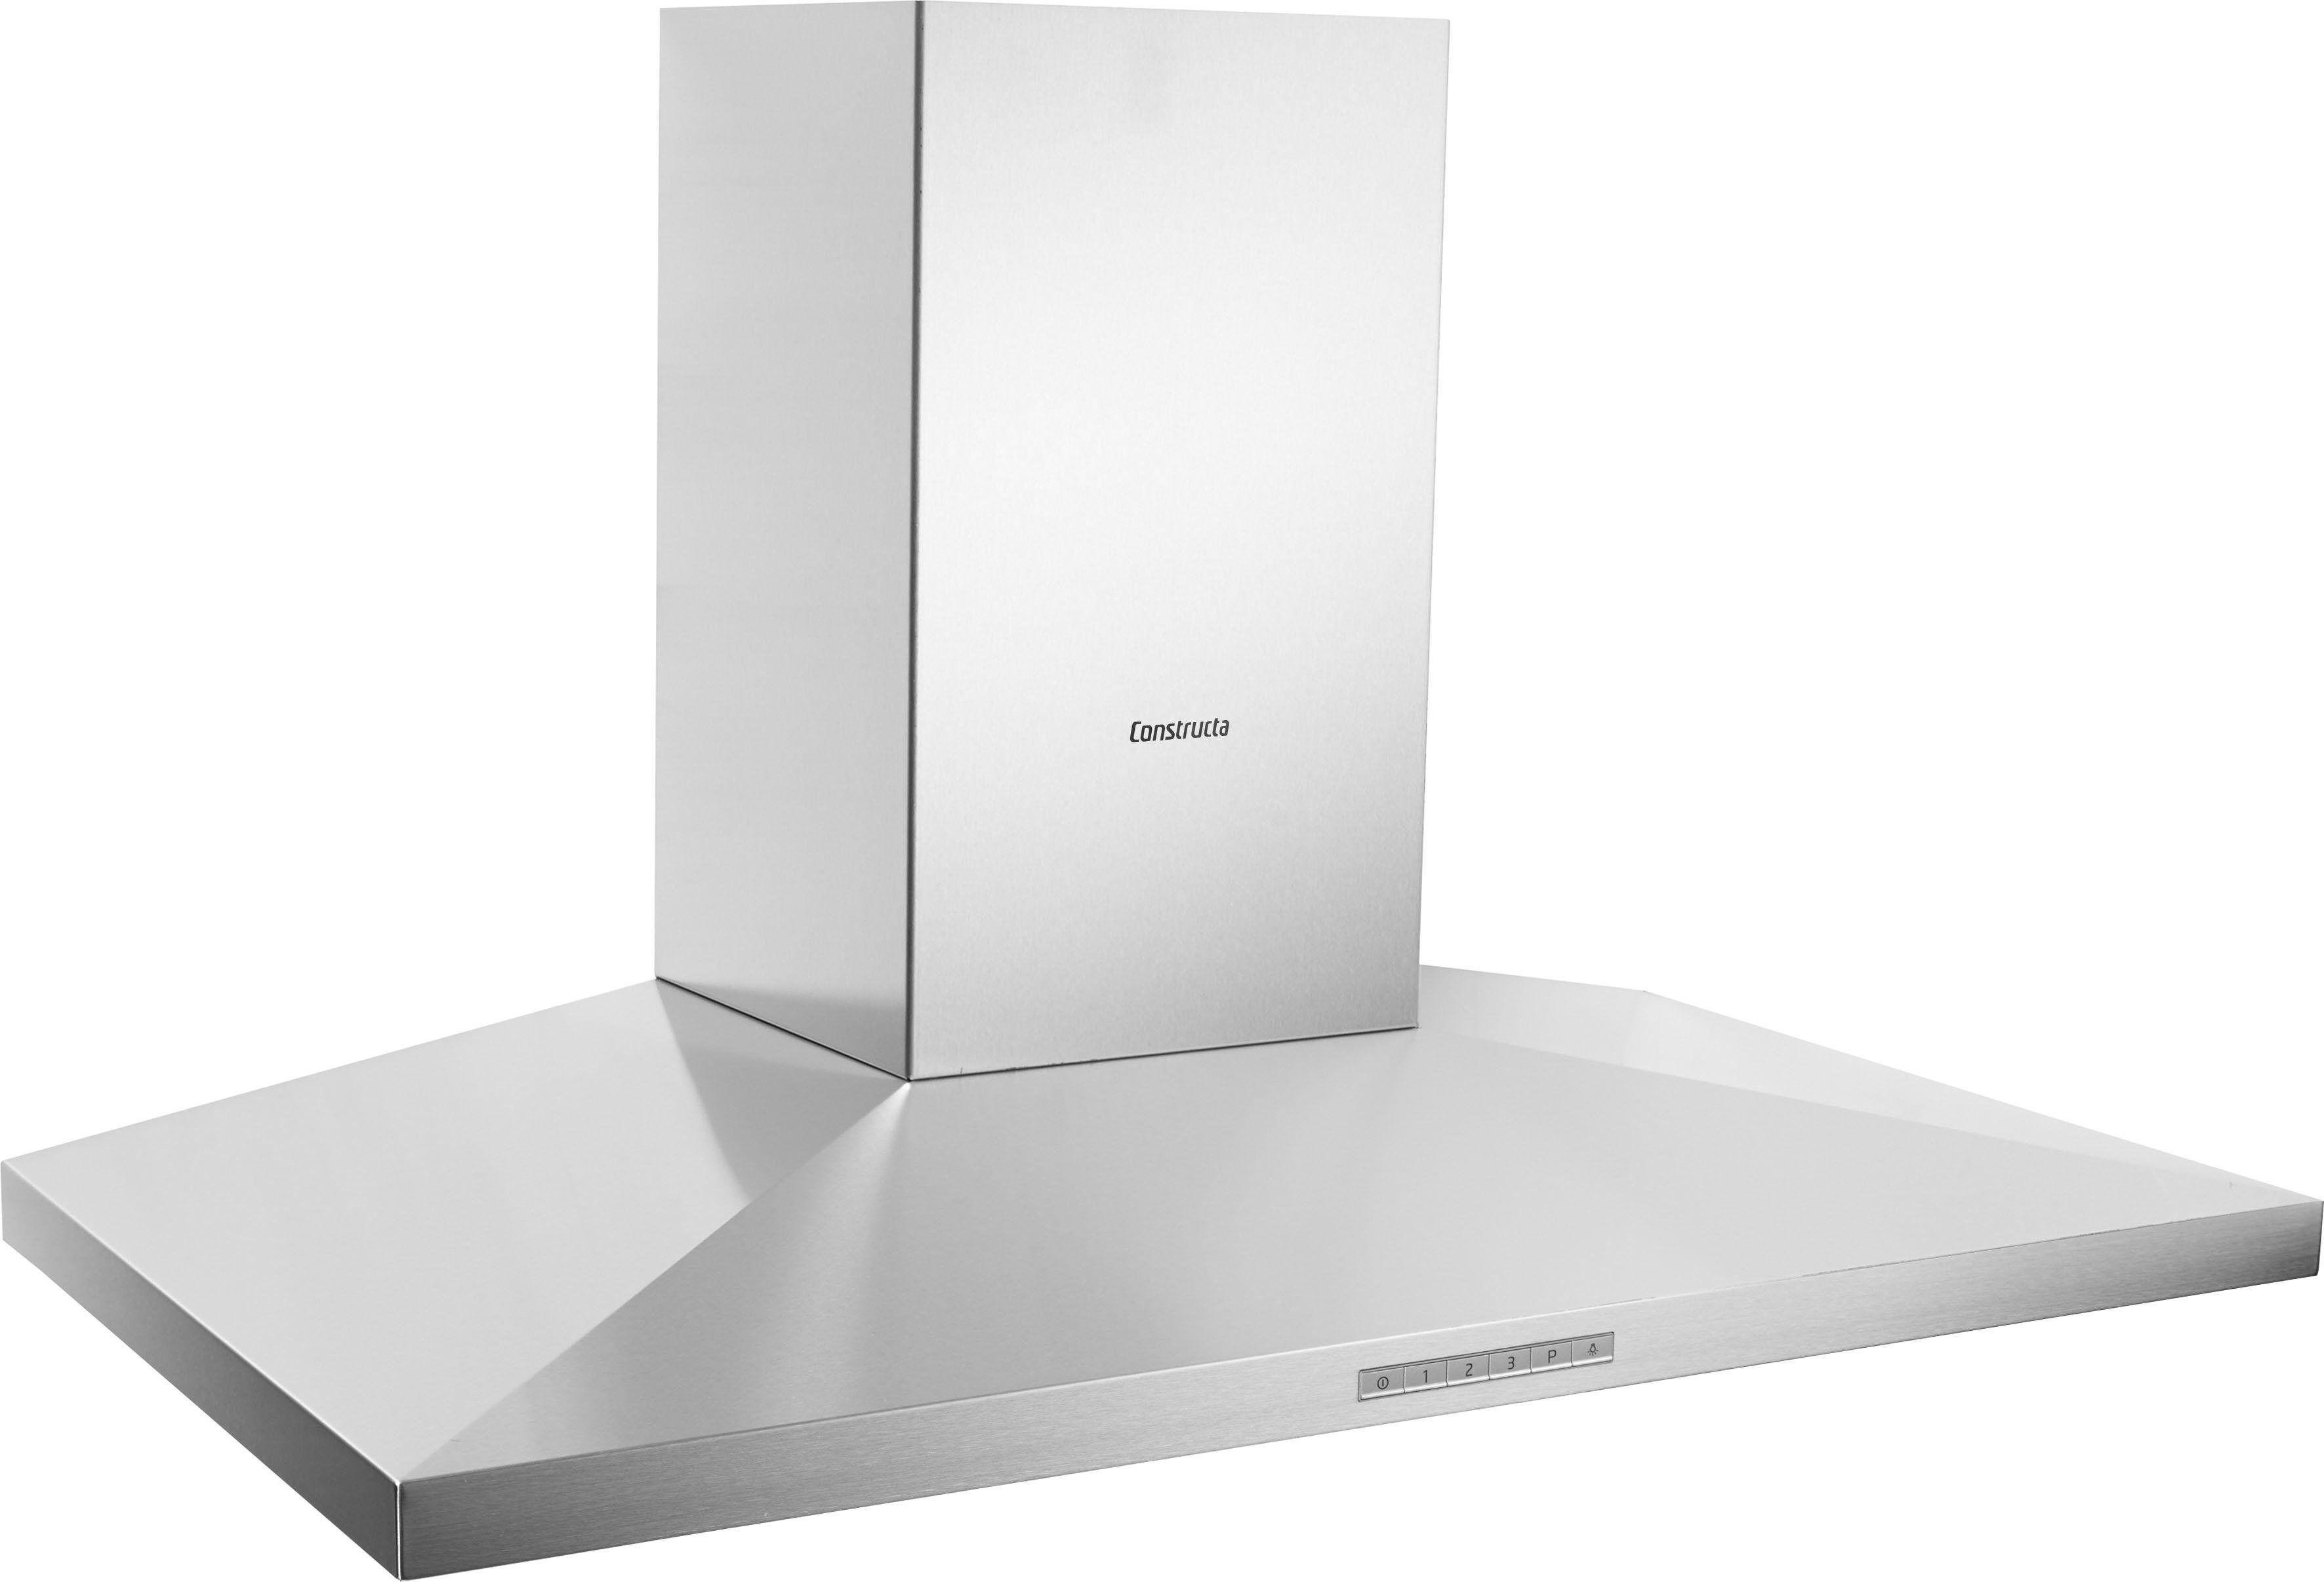 Constructa Wandhaube CD629250, Energieeffizienzklasse A